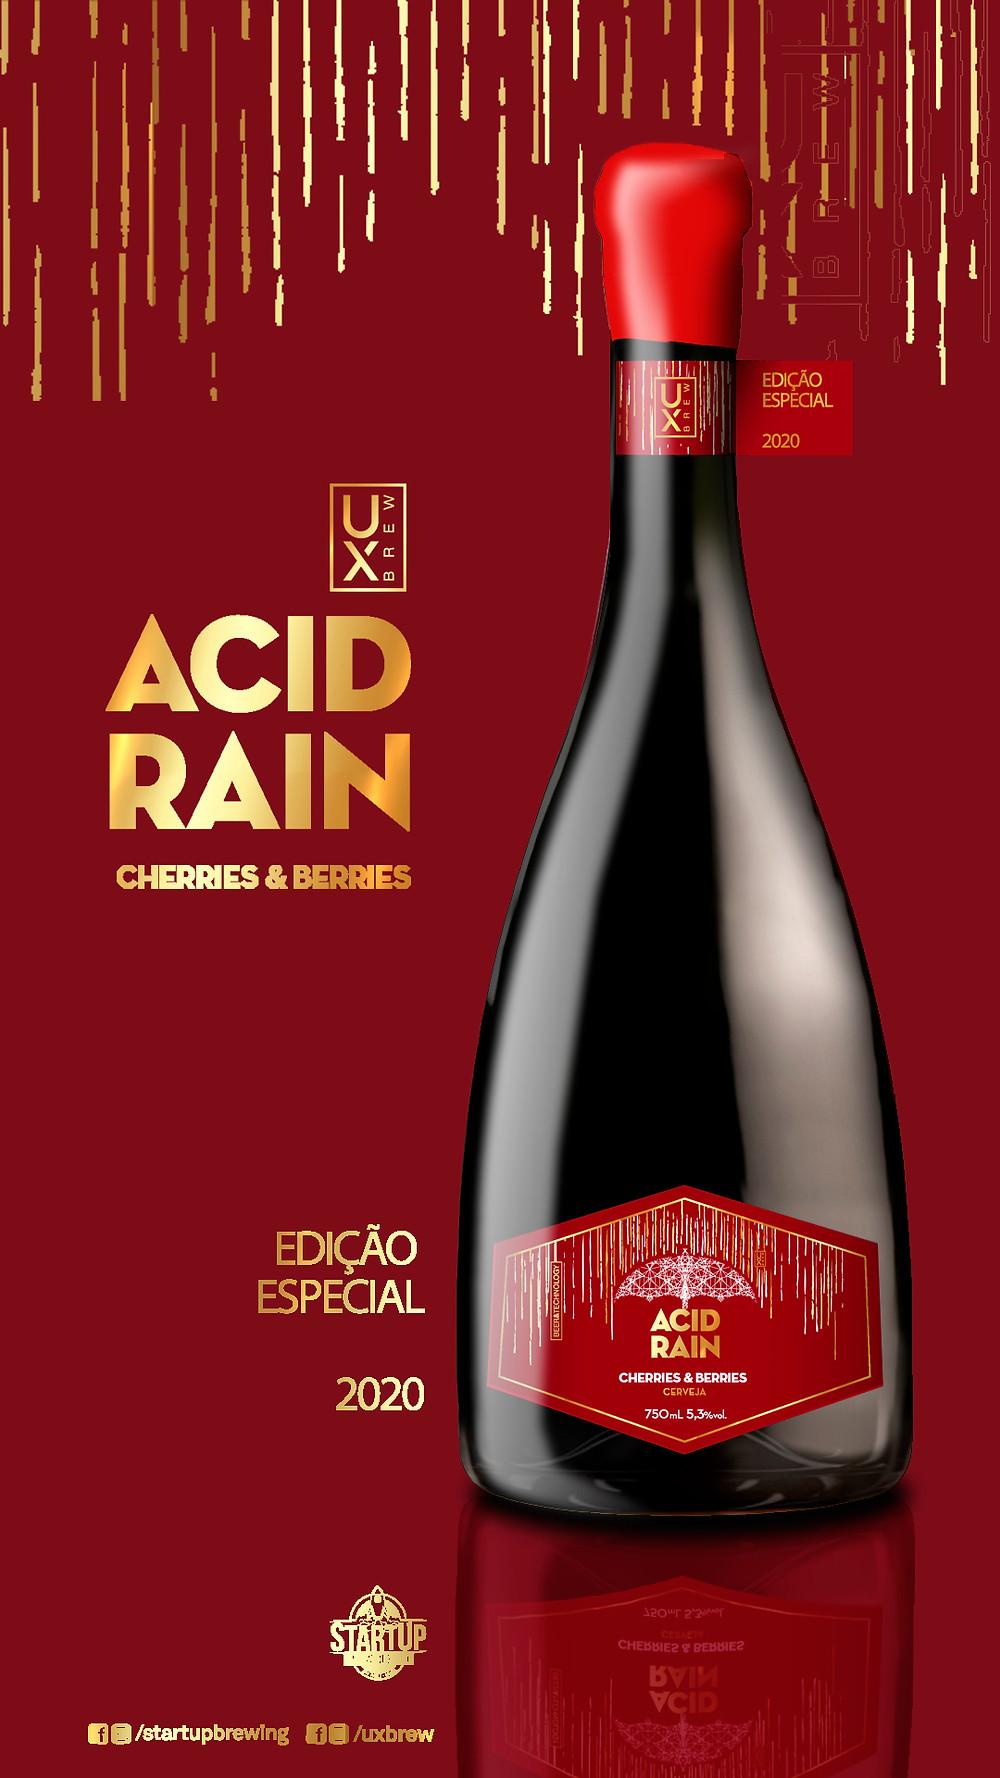 Acid rain ux brew